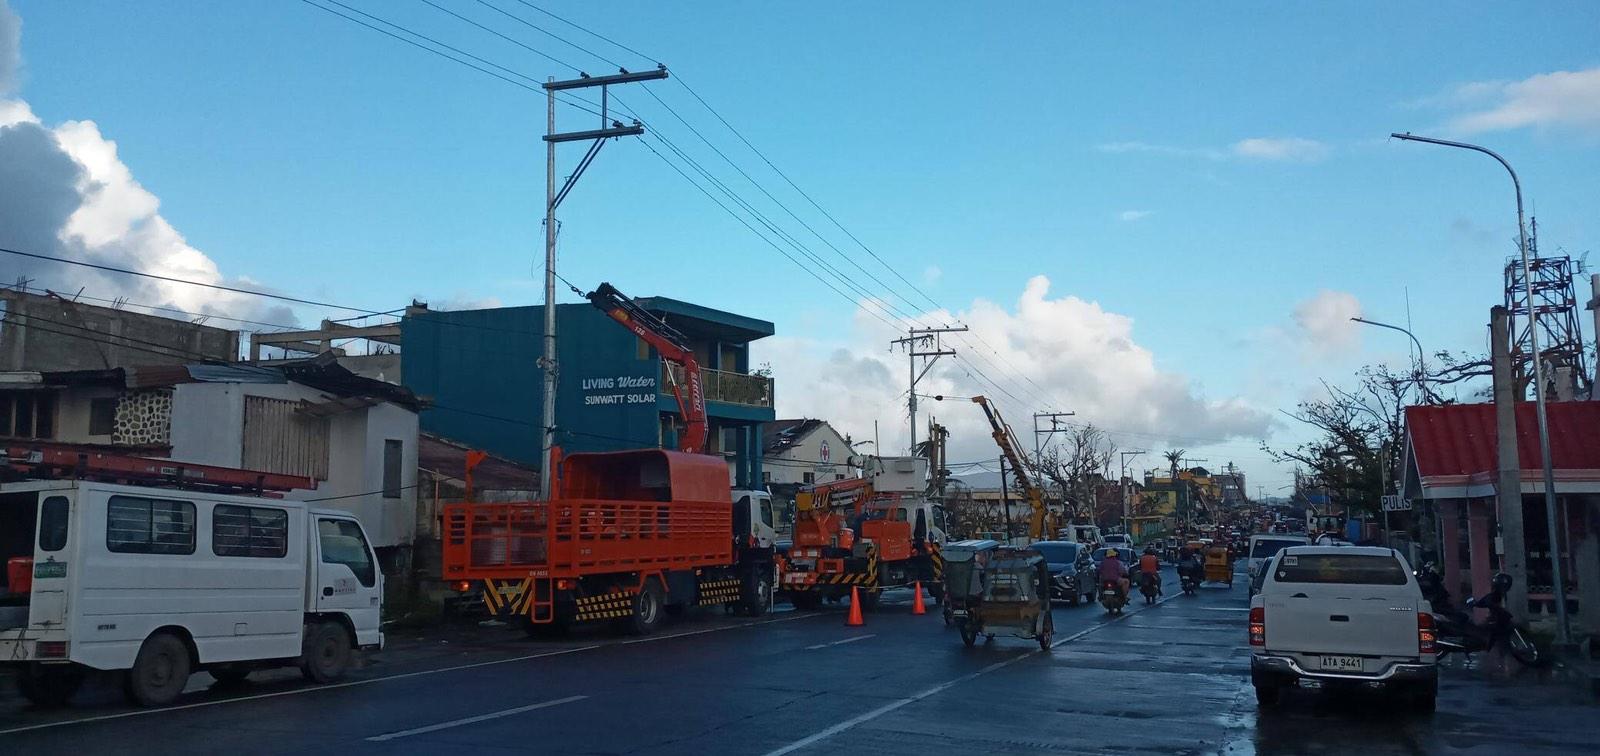 Meralco aids power restoration in typhoon-hit Catanduanes